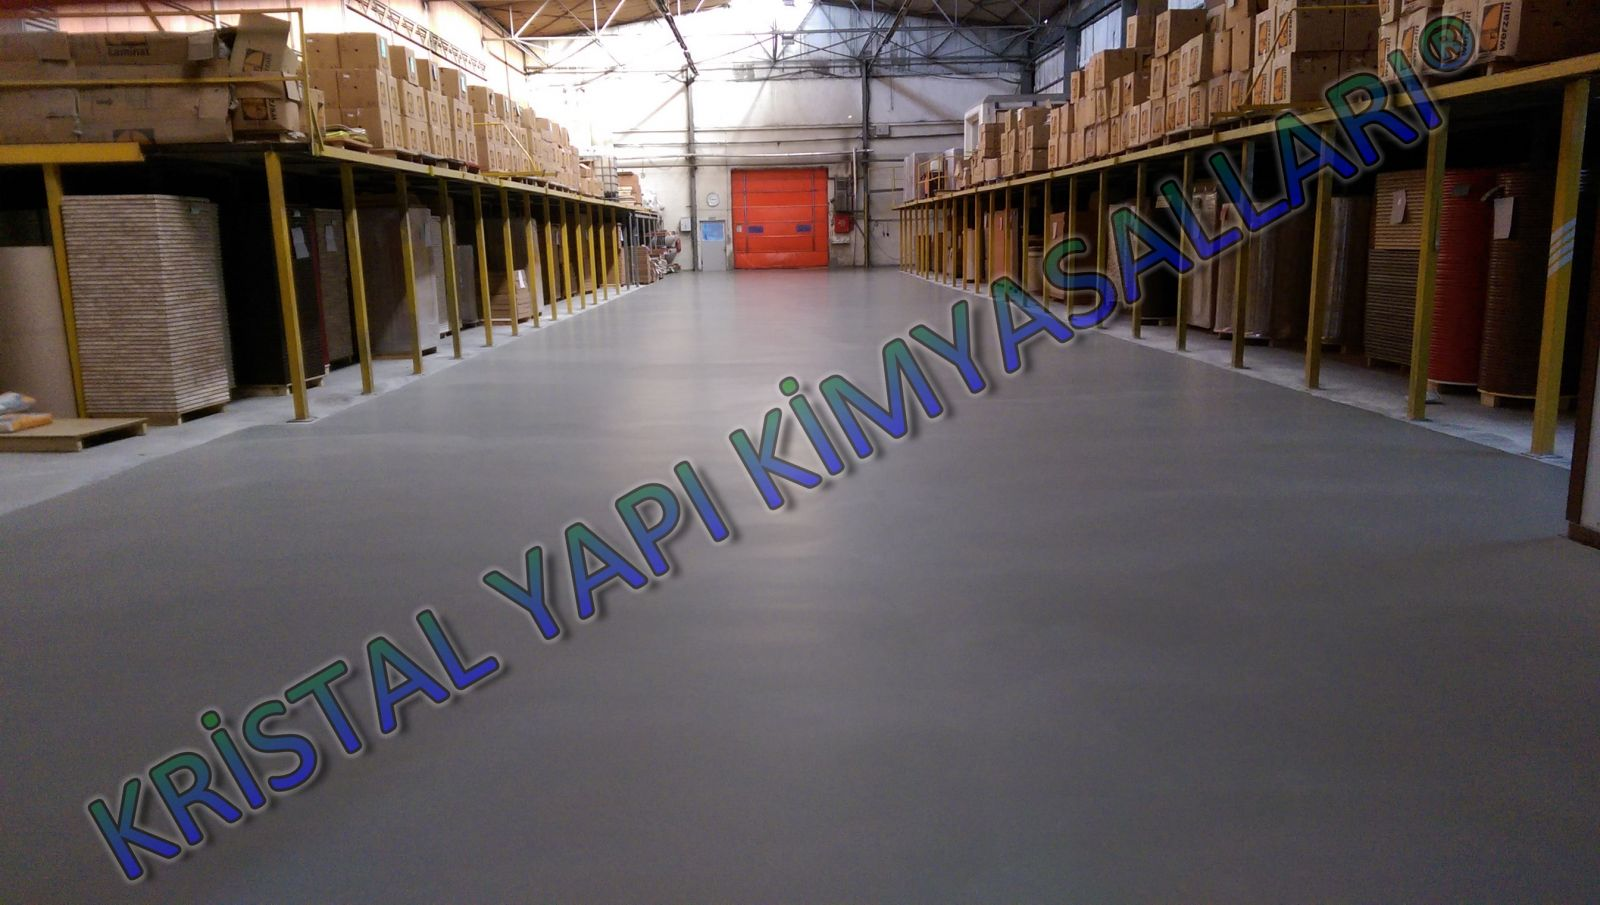 flooropal m top mikro beton zemin kaplama malzemeleri, mikro beton malzemeleri, flooropal mtop